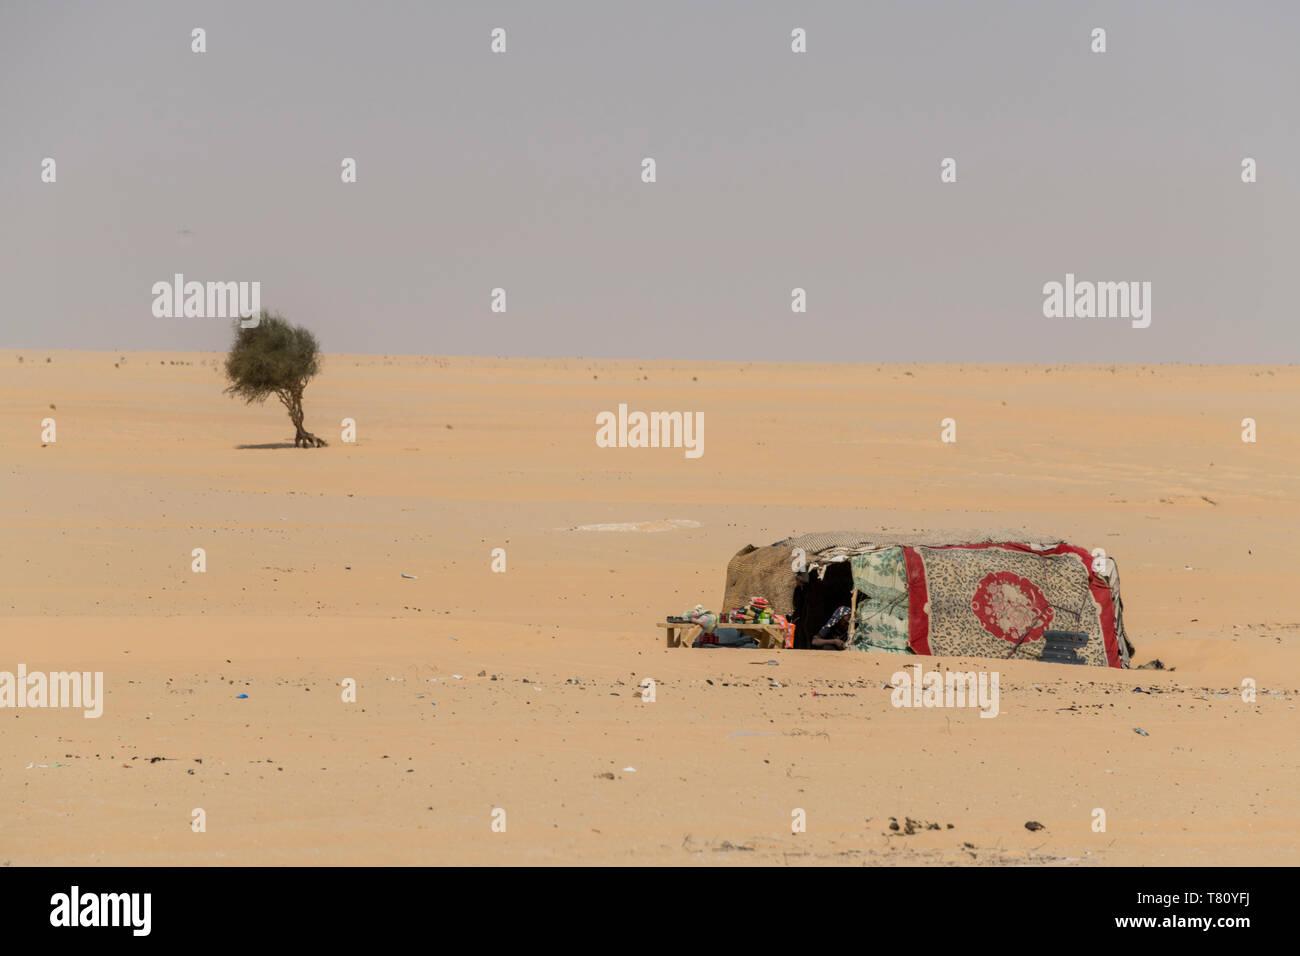 Bedouin tent in the desert between Faya-Largeau and N'Djamena, Chad, Africa - Stock Image